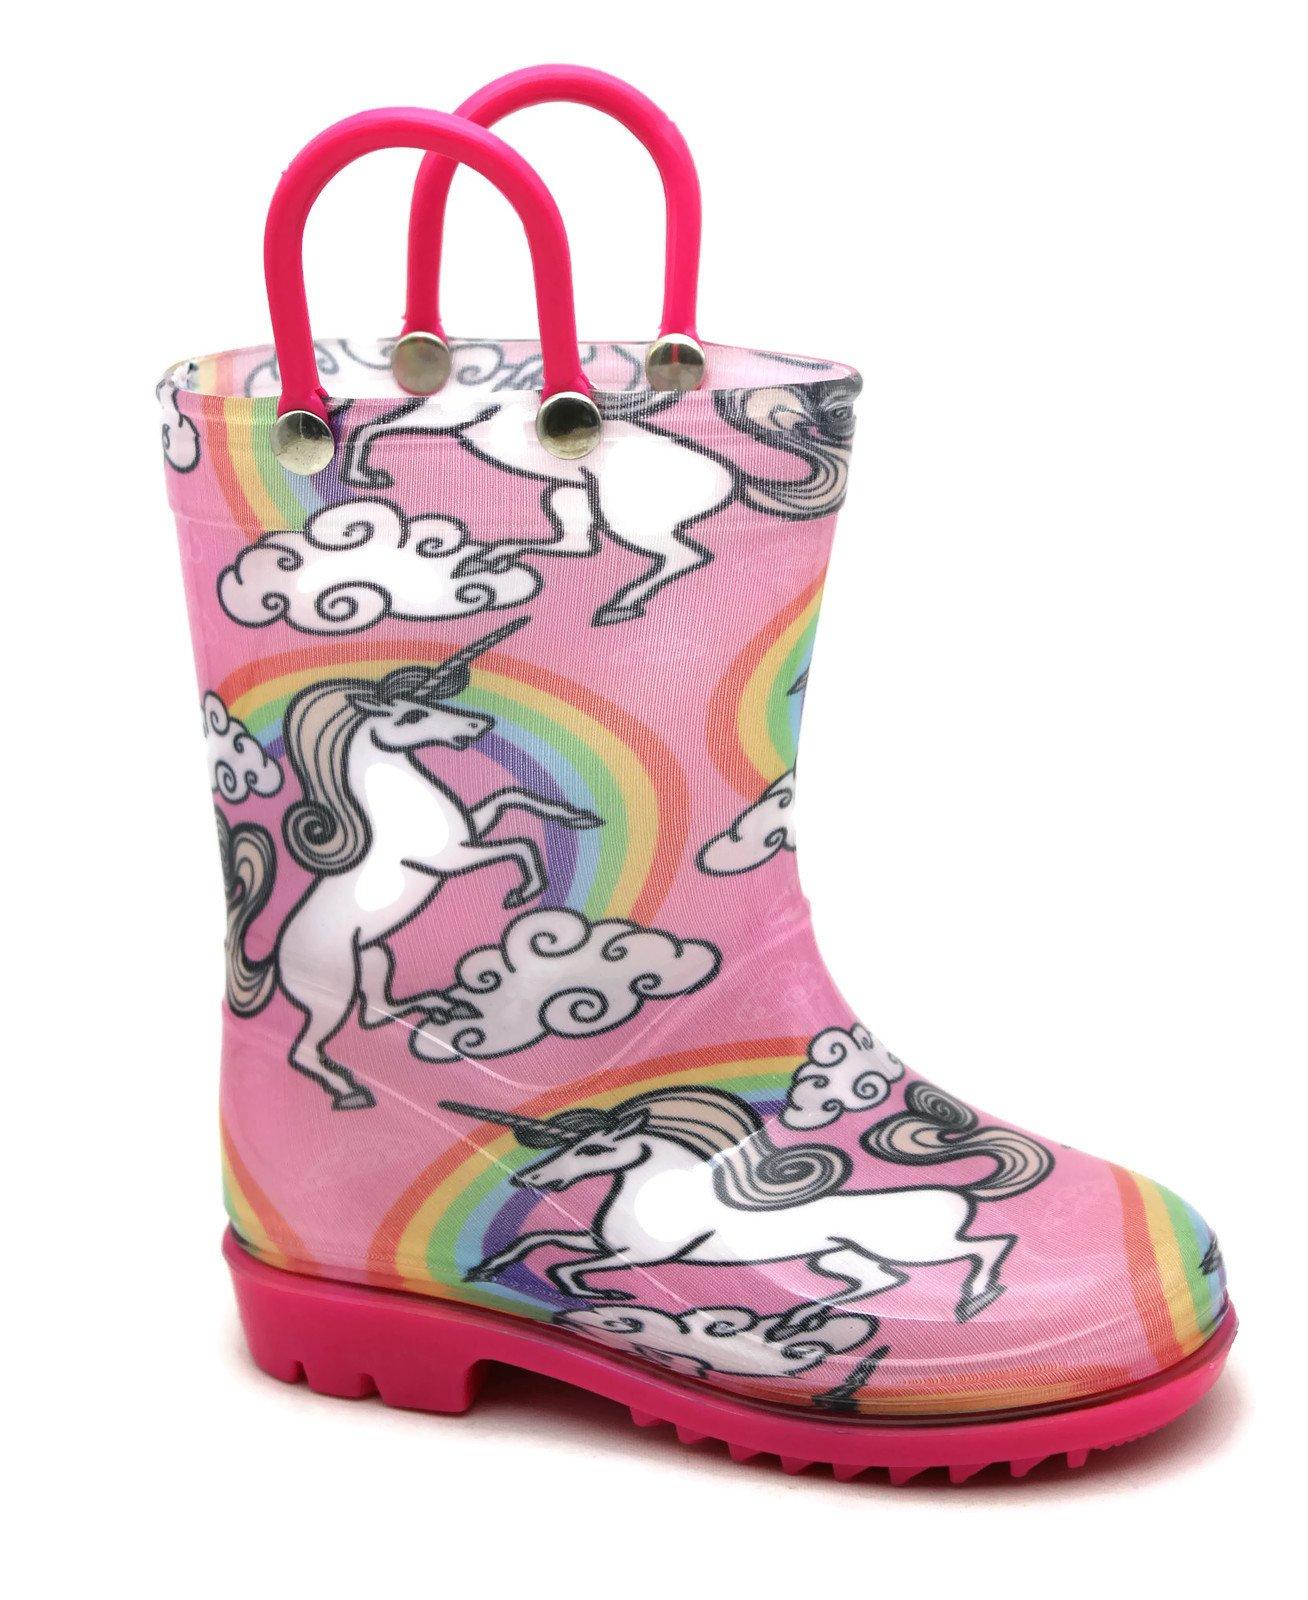 Storm Kidz Kids Girls Unicorn Printed Rainboots, Little Kid 11